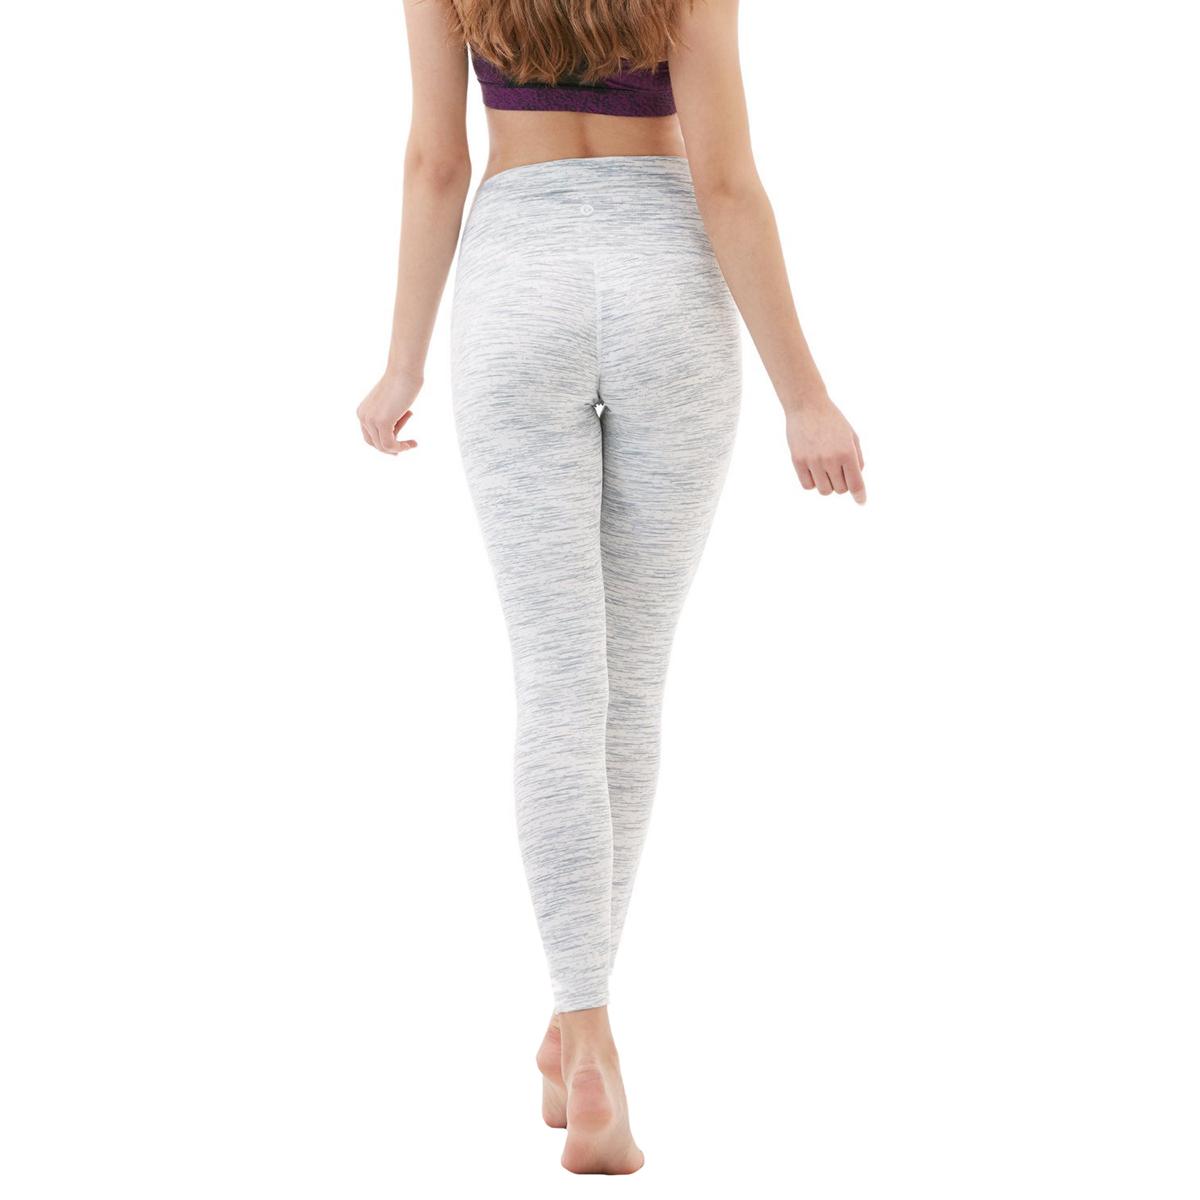 thumbnail 108 - TSLA Tesla FYP42 Women's High-Waisted Ultra-Stretch Tummy Control Yoga Pants